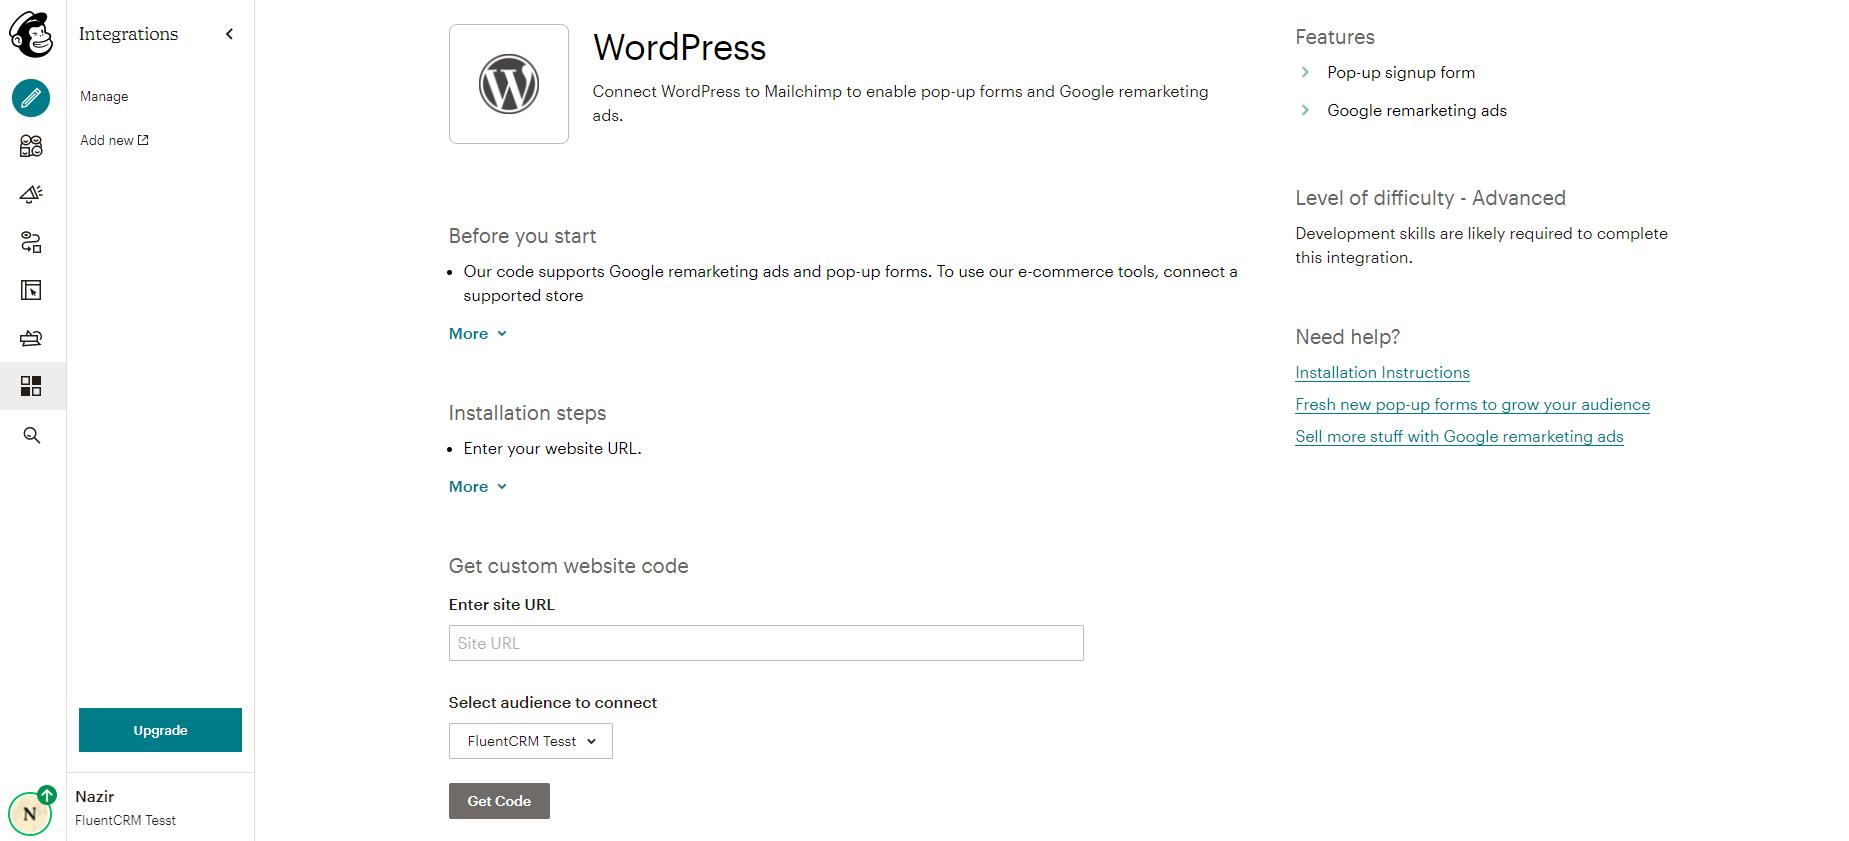 mailchimp, mailchimp for wordpress, mailchimp wordpress integration